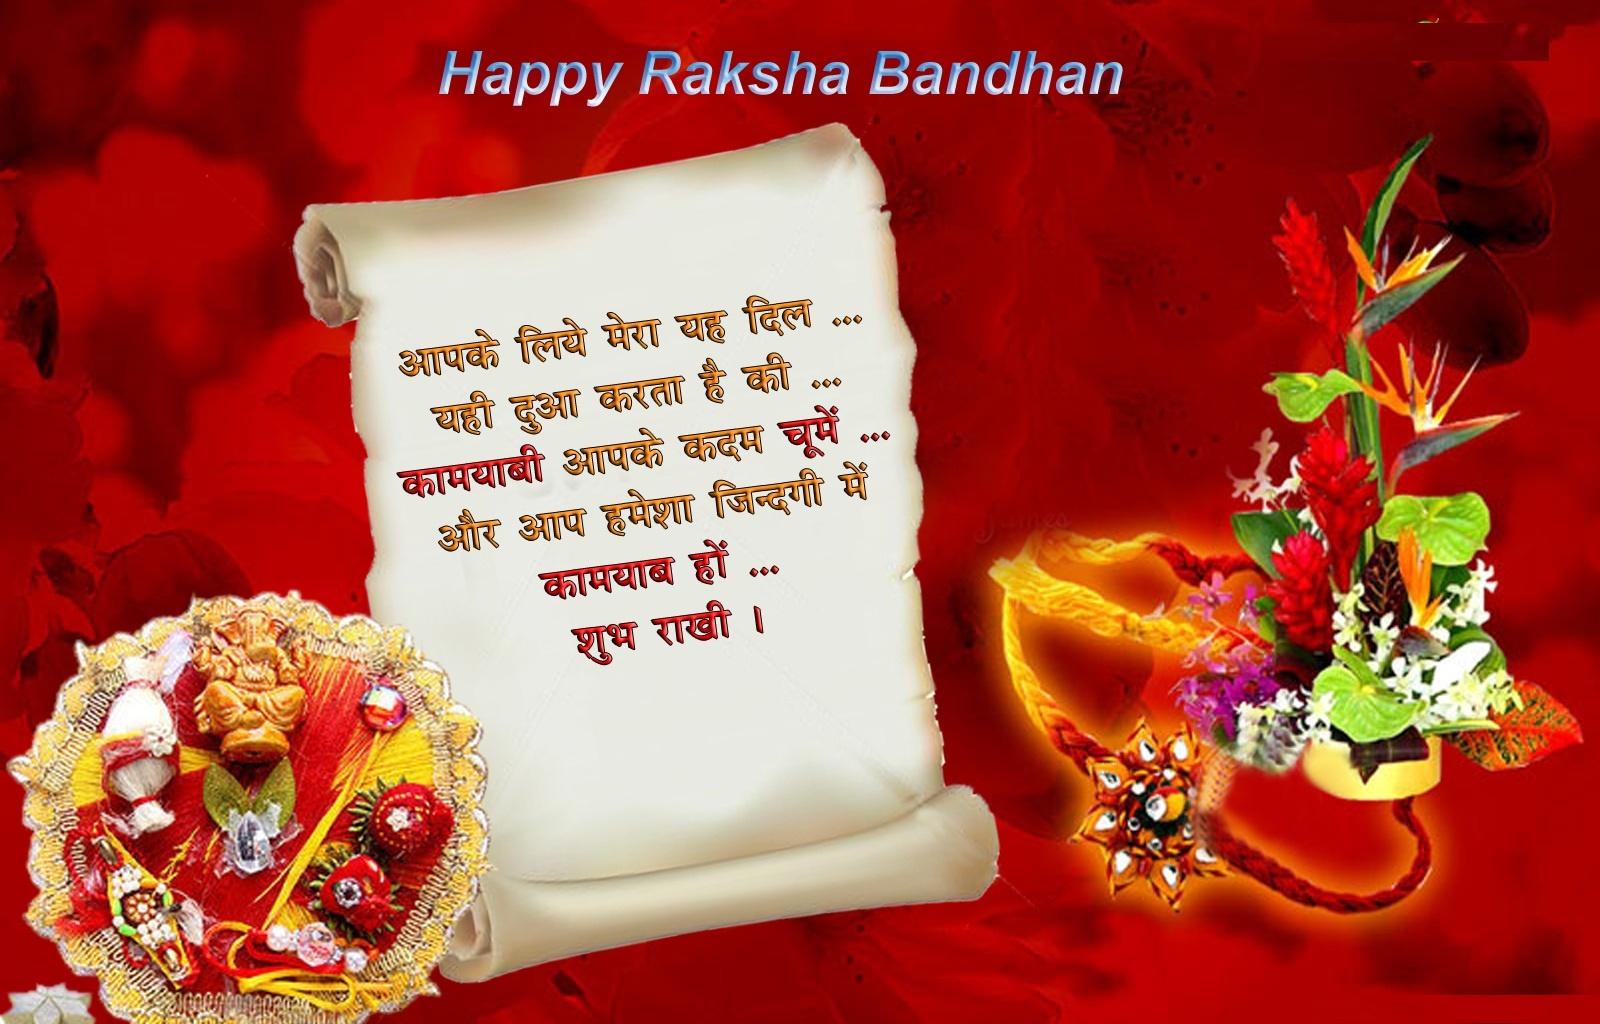 Happy Raksha Bandhan Images Photo Wallpaper Pics HD Download